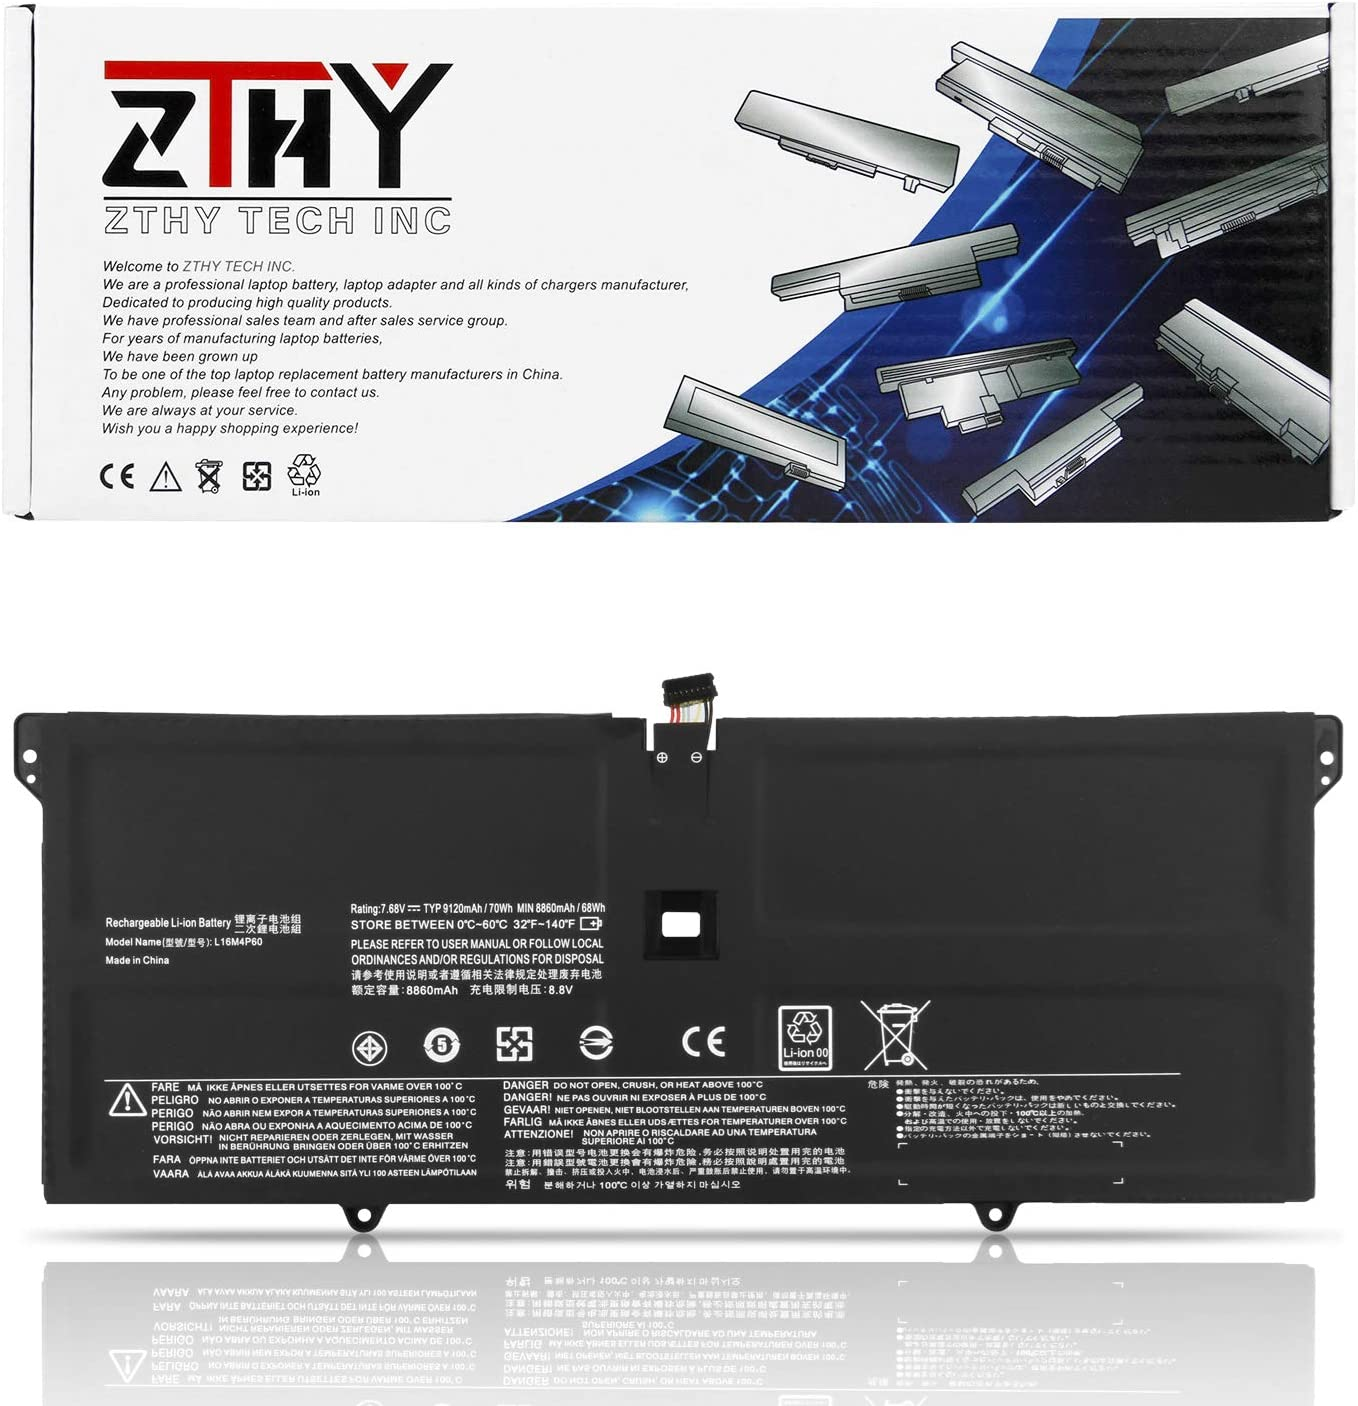 ZTHY L16M4P60 L16C4P61 Laptop Battery for Lenovo Yoga 920 920-13IKB 920-13IKB-80Y7 80Y70023C 80Y70030GE 80Y7008RSP 80Y80029GE 80Y70066US 80Y70040MZ 80Y70035GE 5B10N01565 5B10N17665 70Wh 9120mAh 7.68V